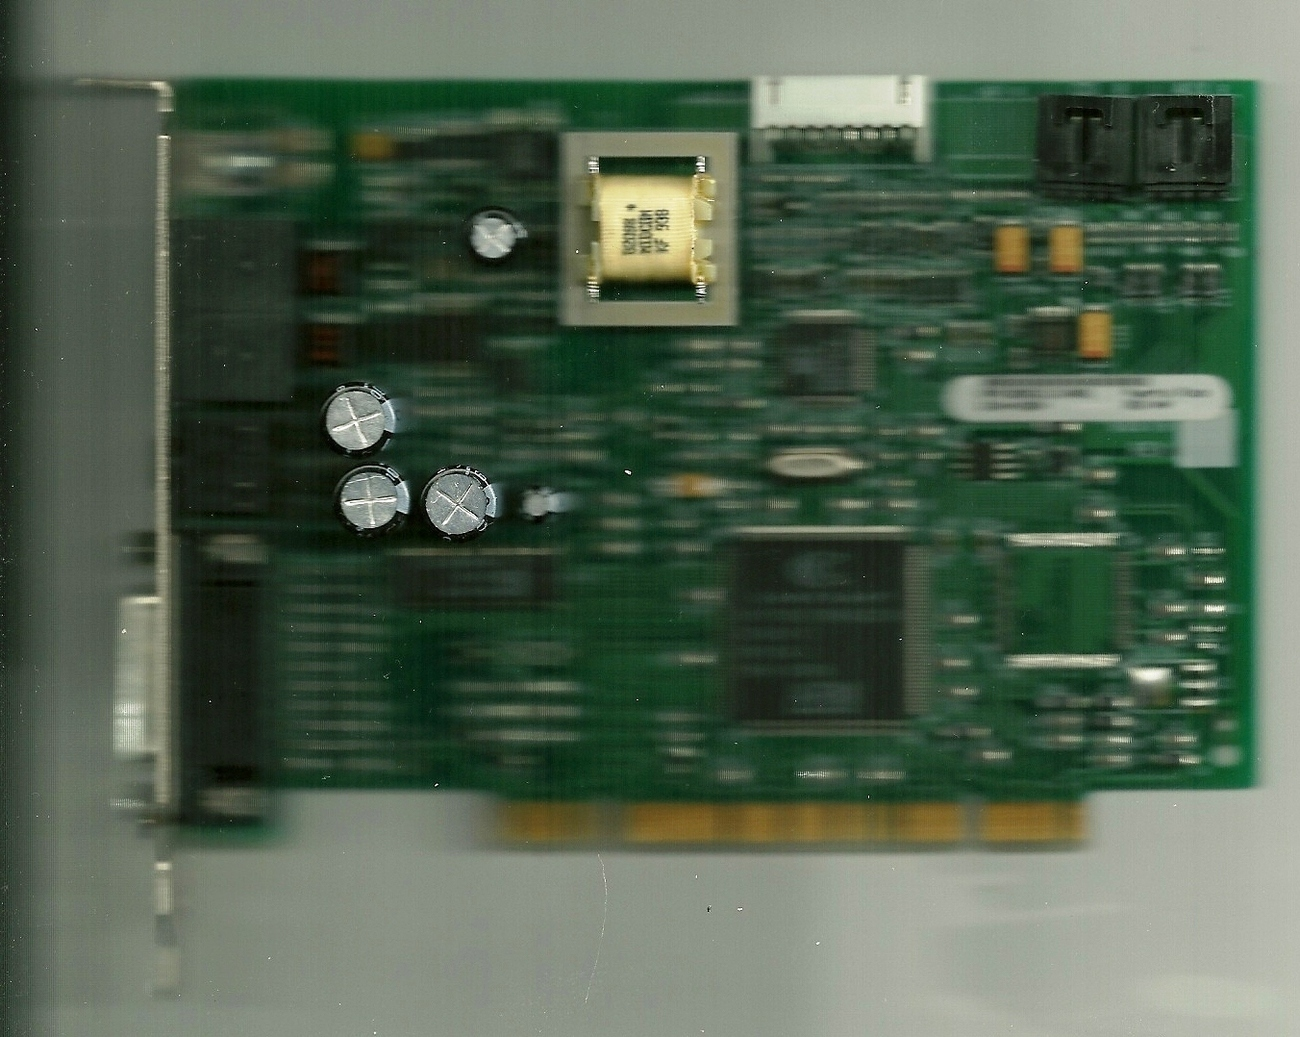 Hp Compaq Dc5800 Audio Driver